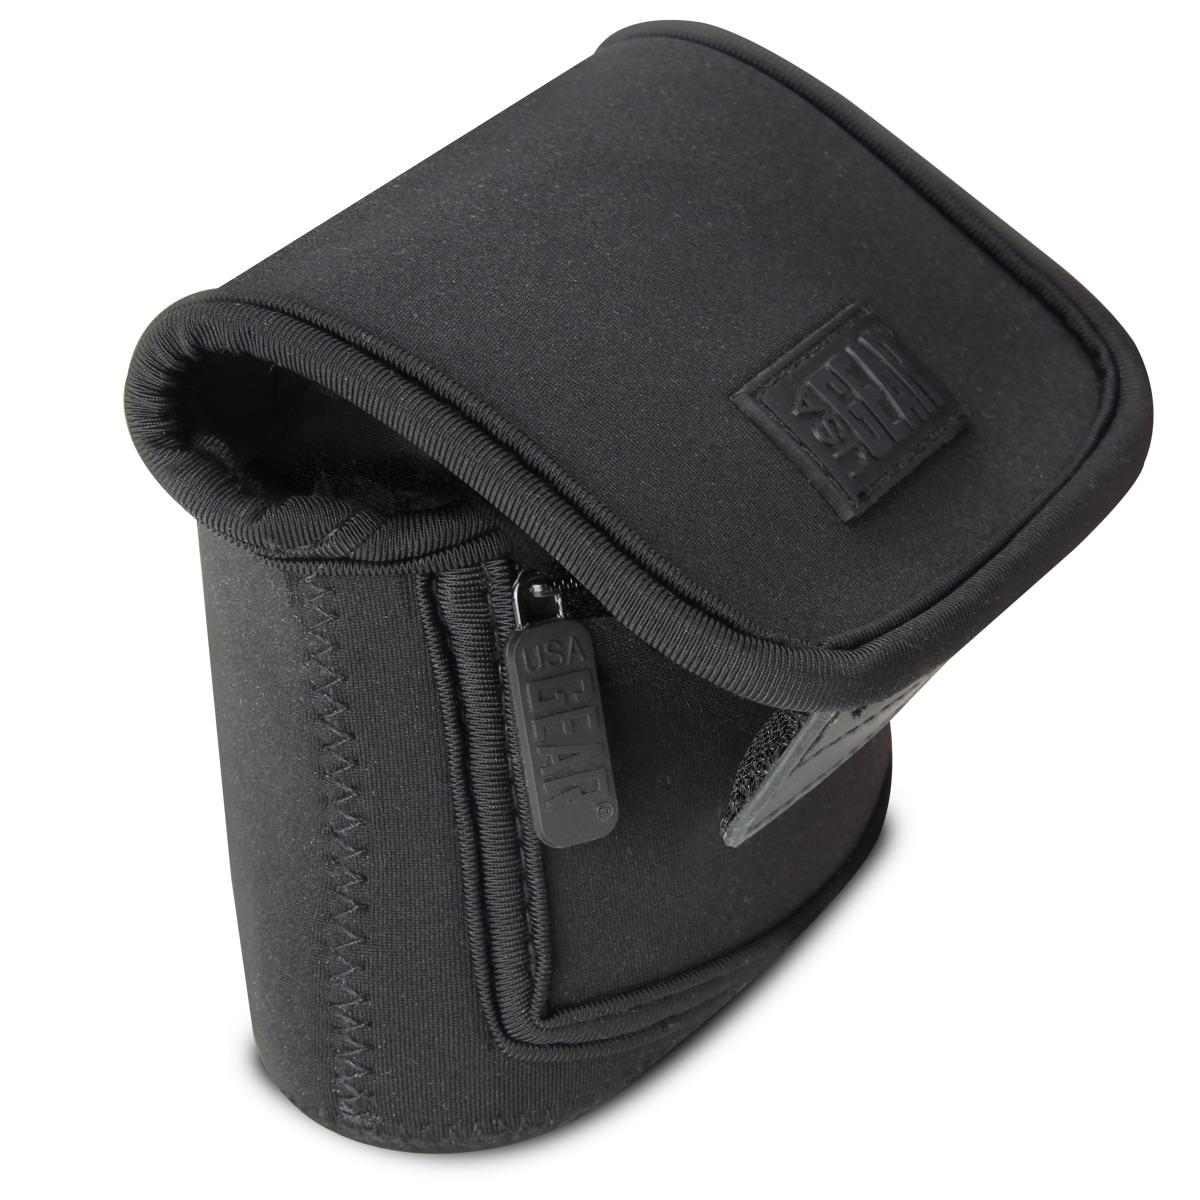 Logitech USA Gear FlexARMOR Compact Mouse Carrying Case w...